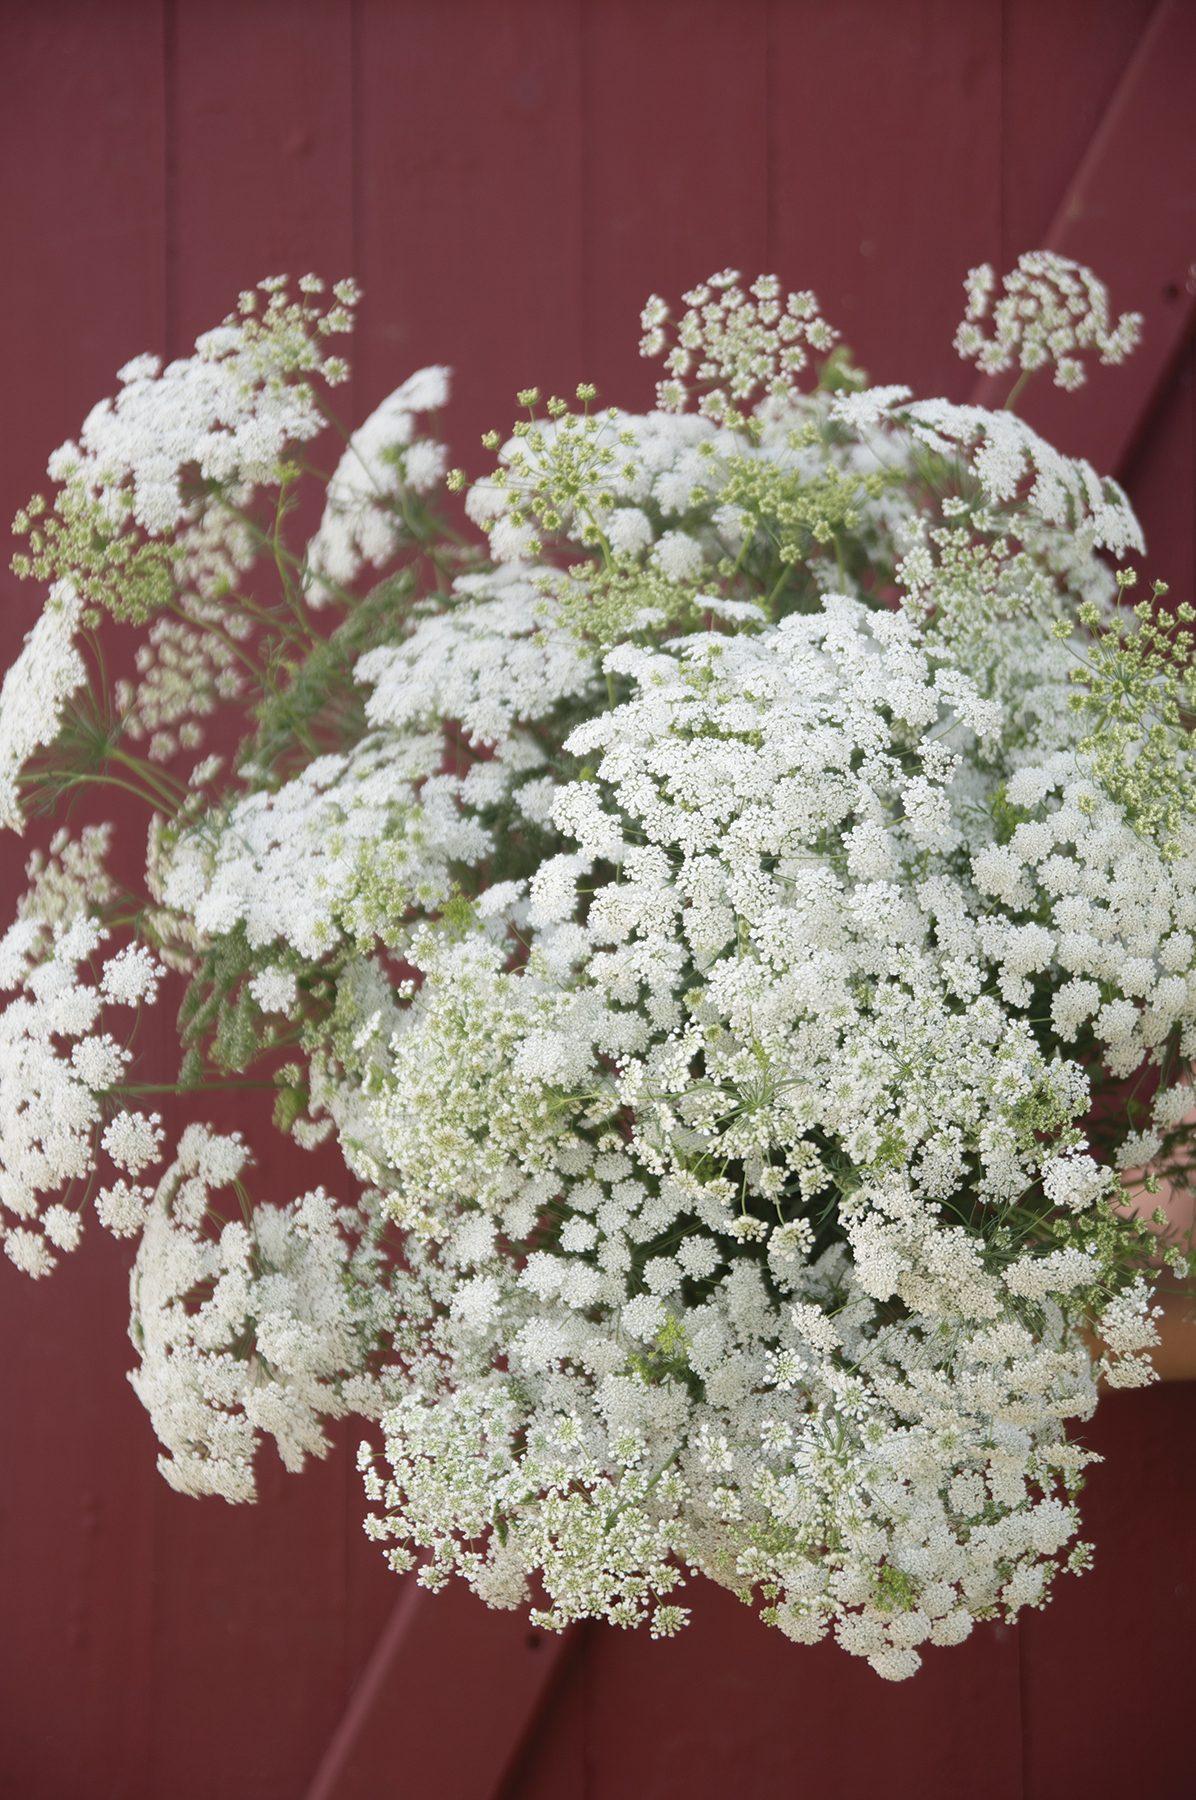 White Dill False Queen Anne's Lace Ammi